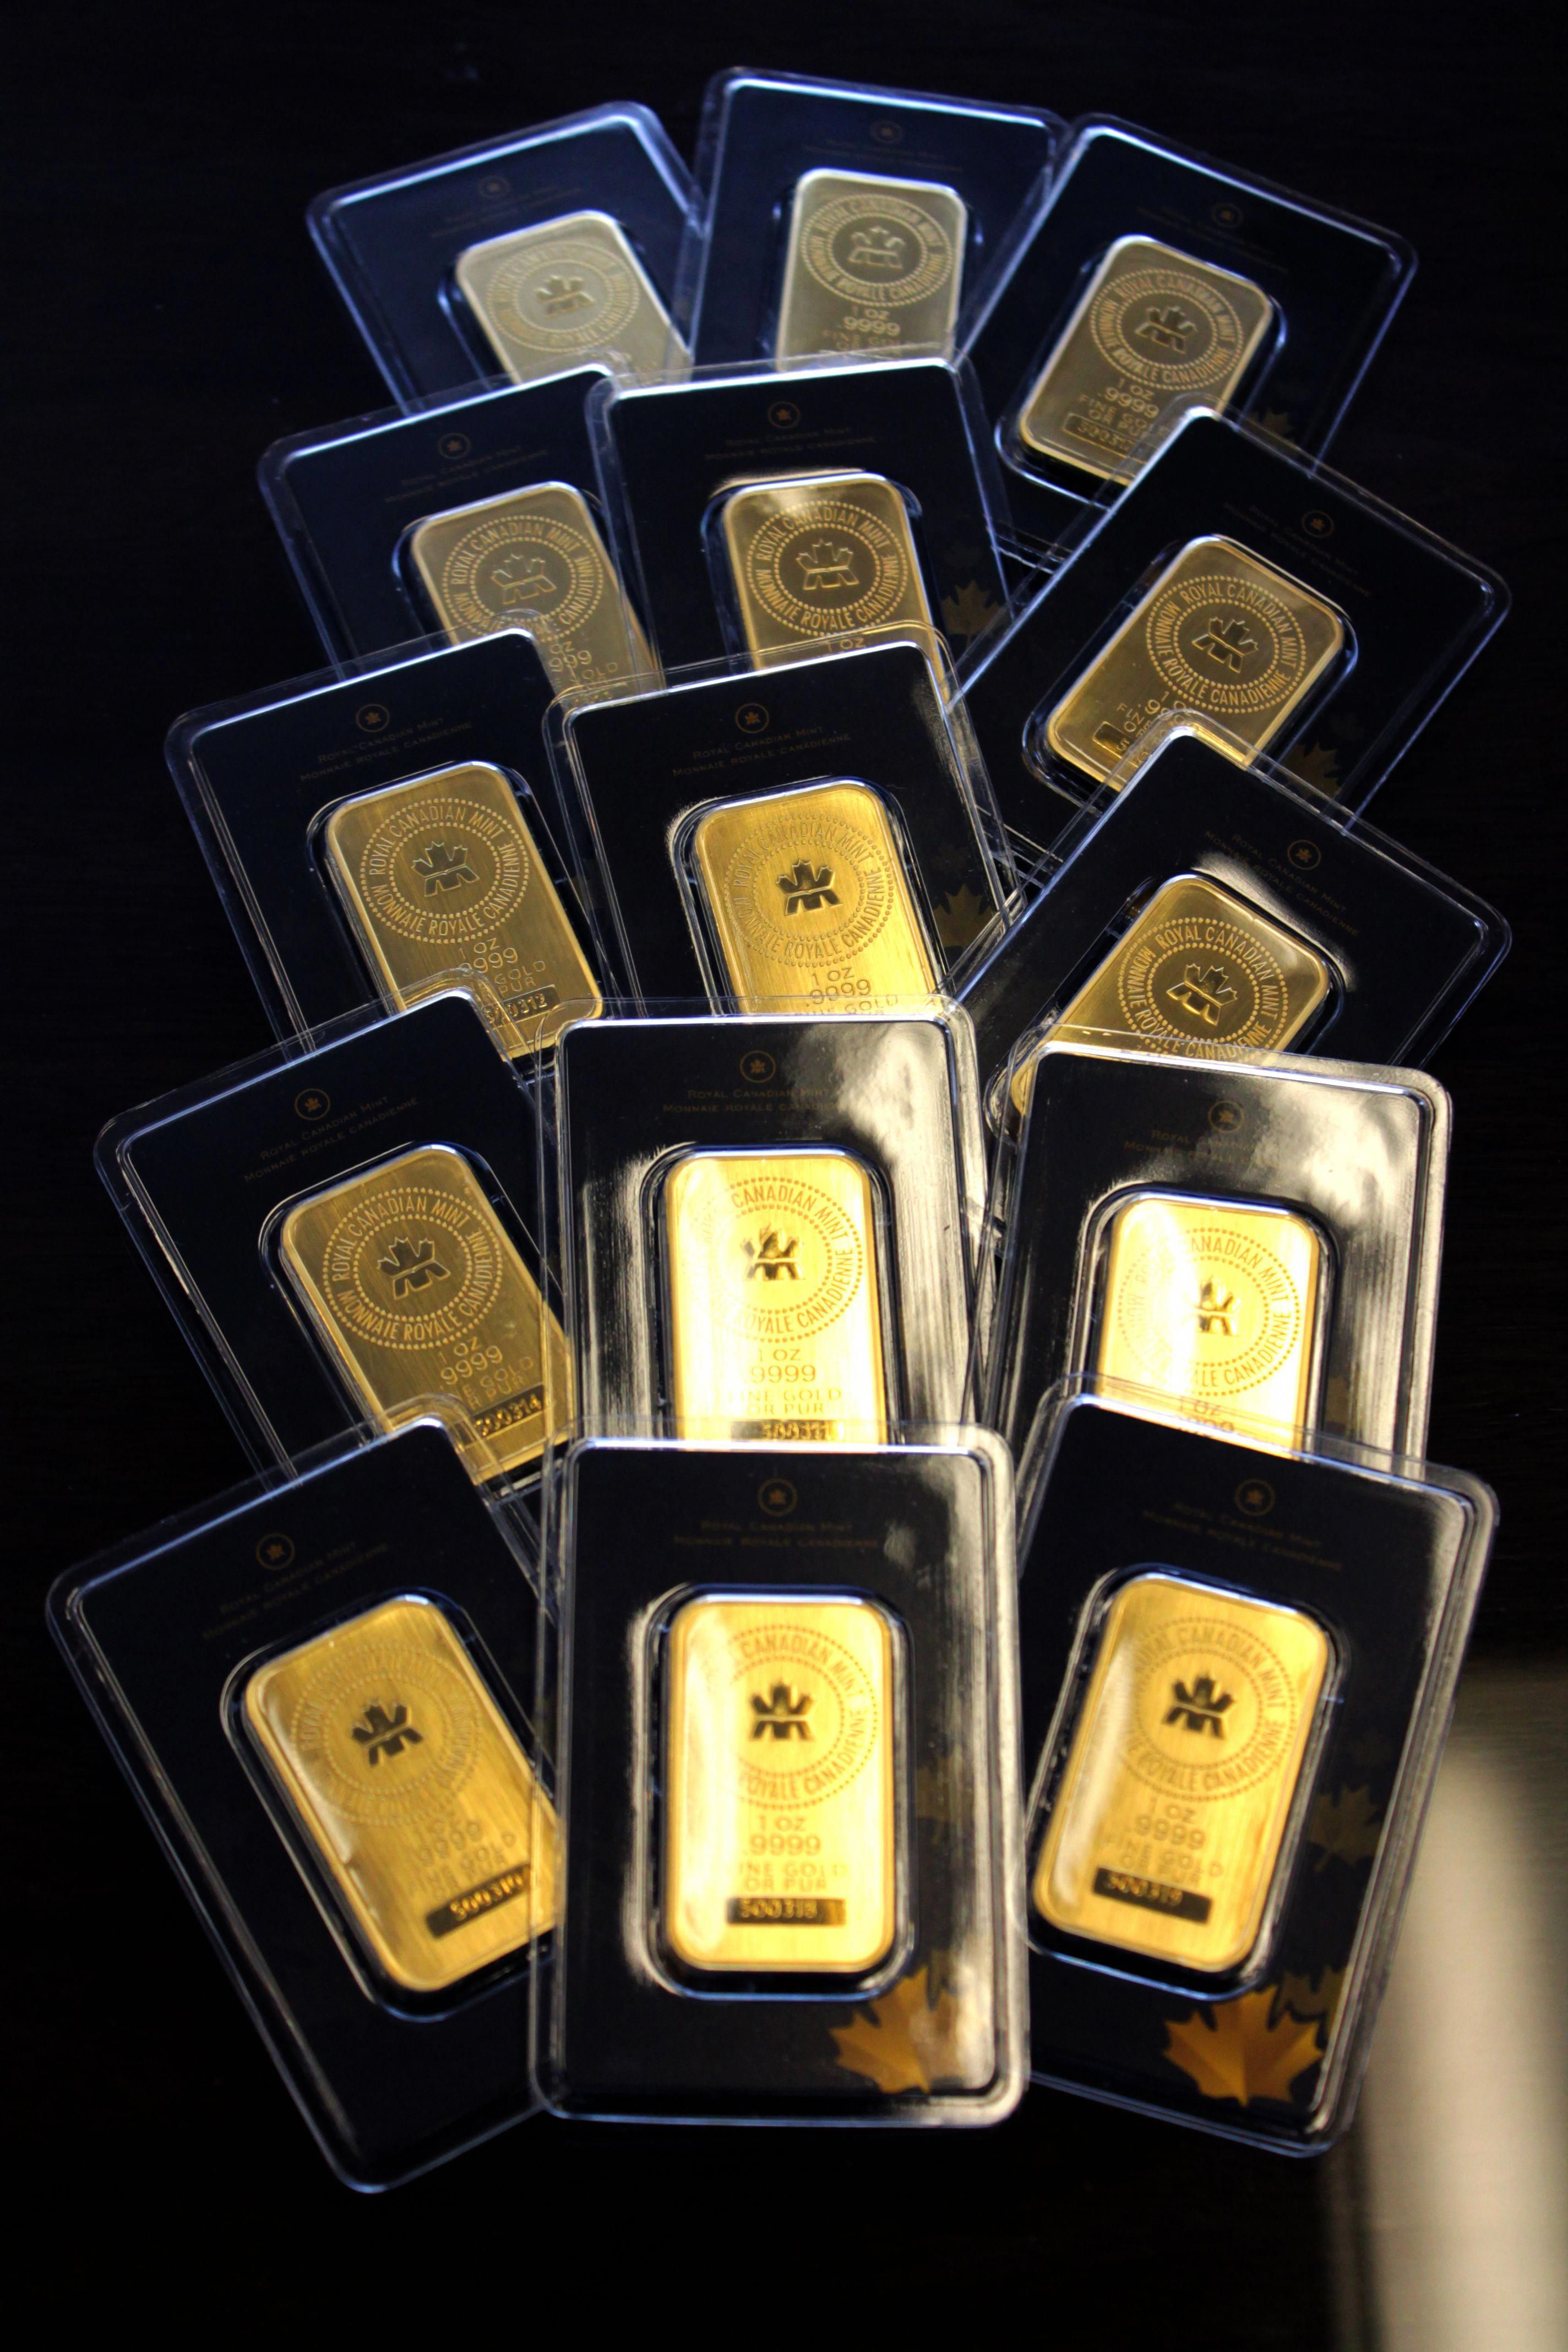 1 Oz Royal Canadian Mint Gold Wafer Bar Goldwafer Gold Finegold Goldbullion Gold Bullion Bars Gold Money Gold Bullion